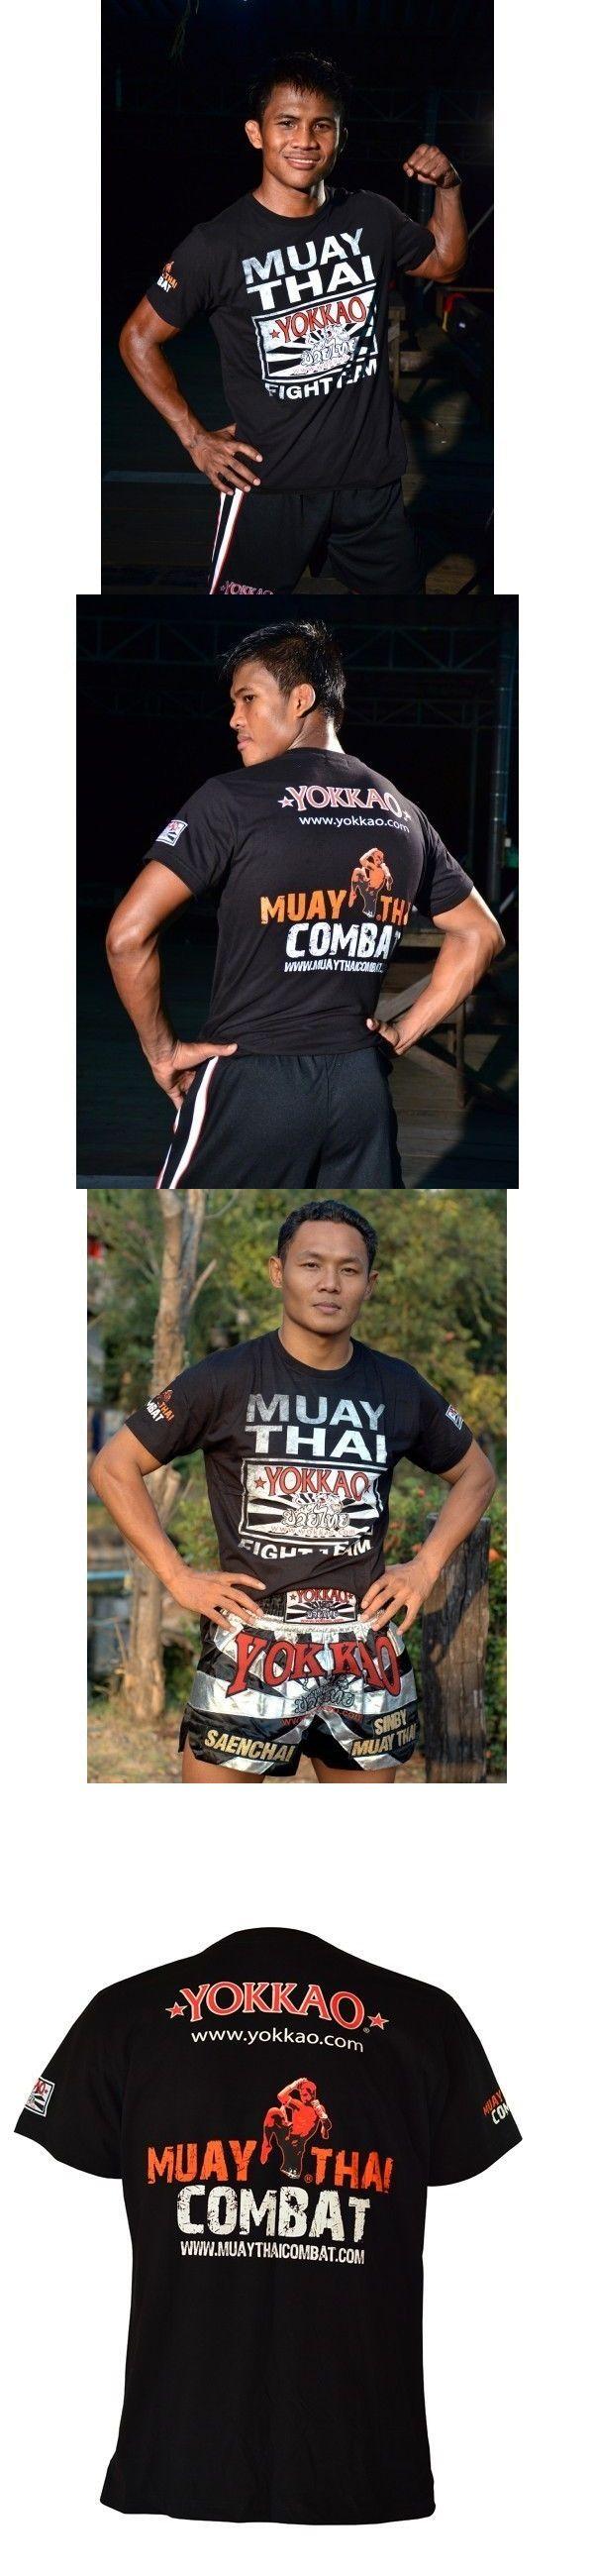 Shirts 73983: Yokkao Fight Team Black Muay Thai T-Shir Size L Muay Thai Kickboxing Ufc Mma Bjj -> BUY IT NOW ONLY: $32 on eBay!